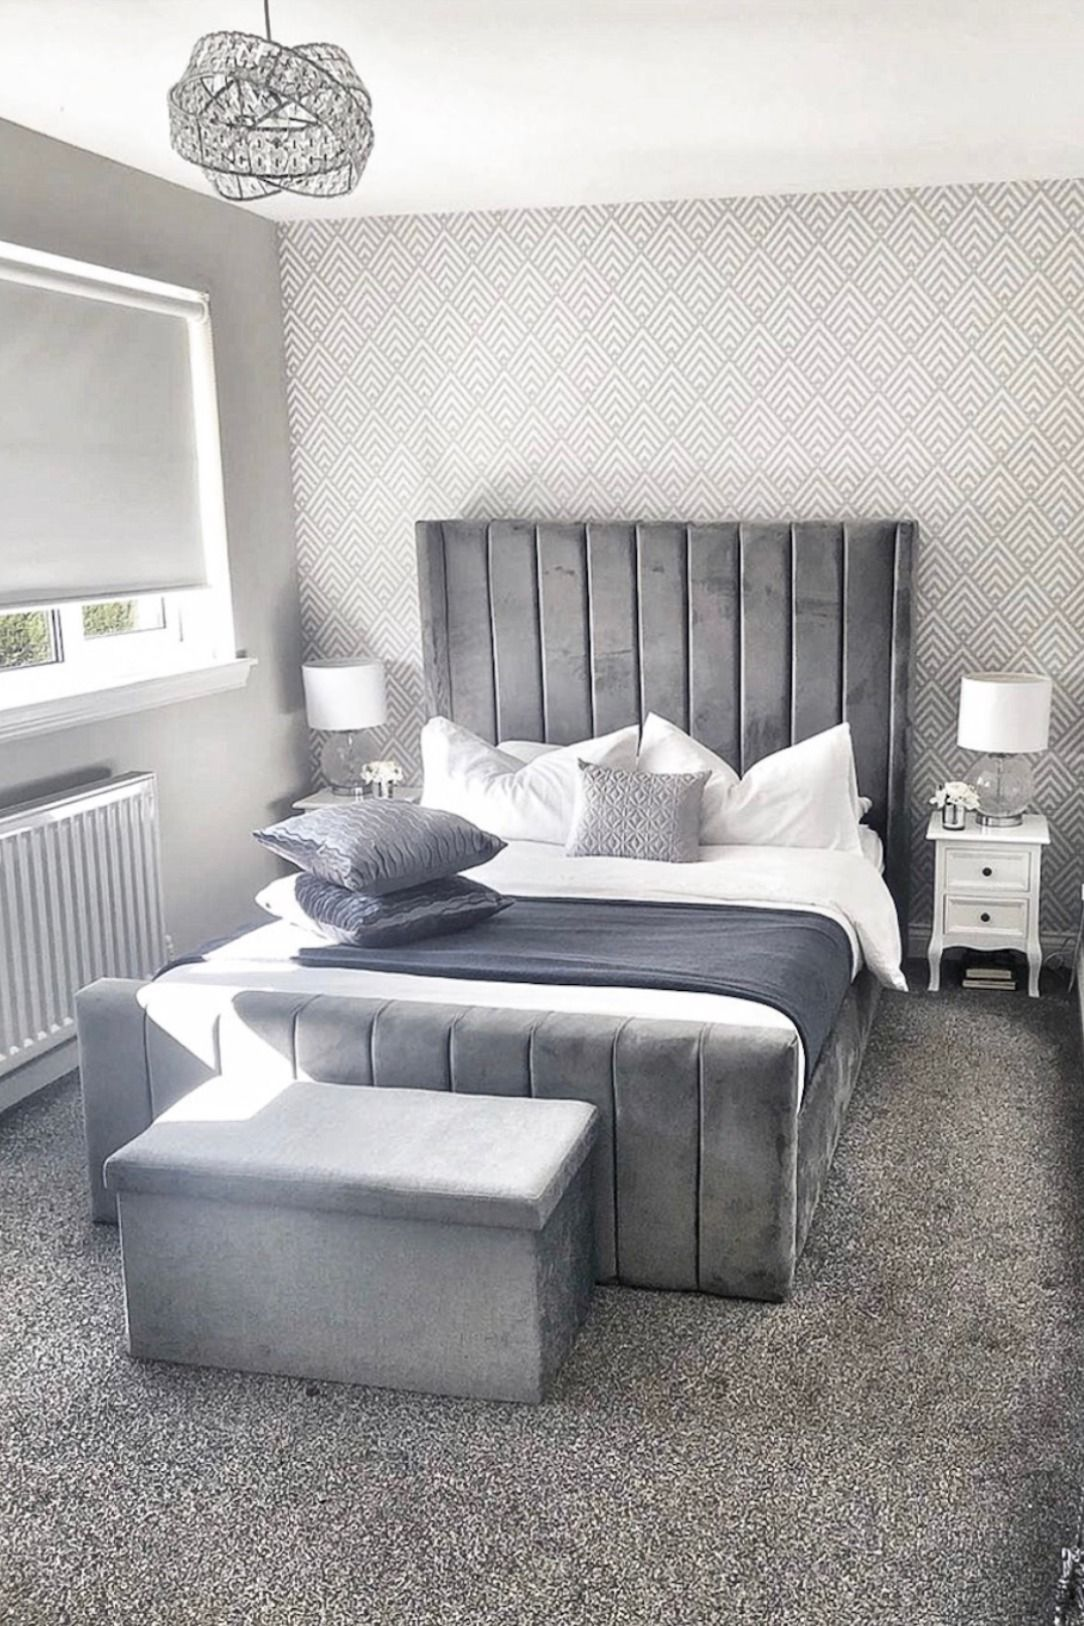 small bedroom ideas silver 1084x1626